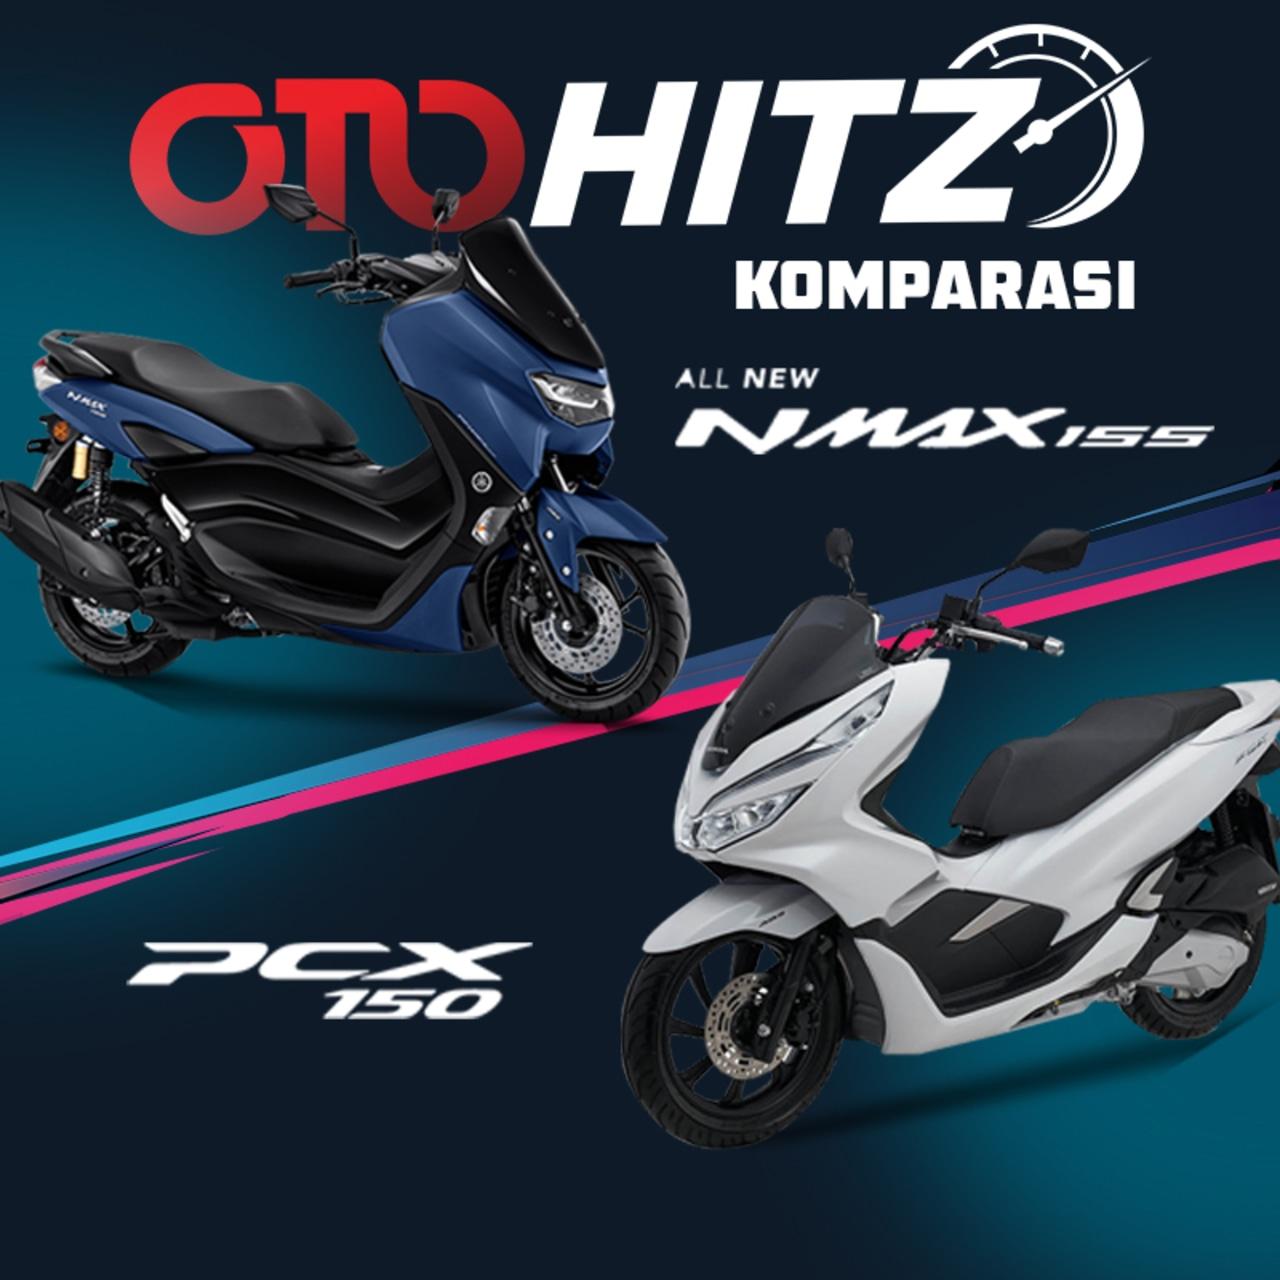 OTOHITZ, OTOHITZ VII, Komparasi, Yamaha NMax, Honda PCX